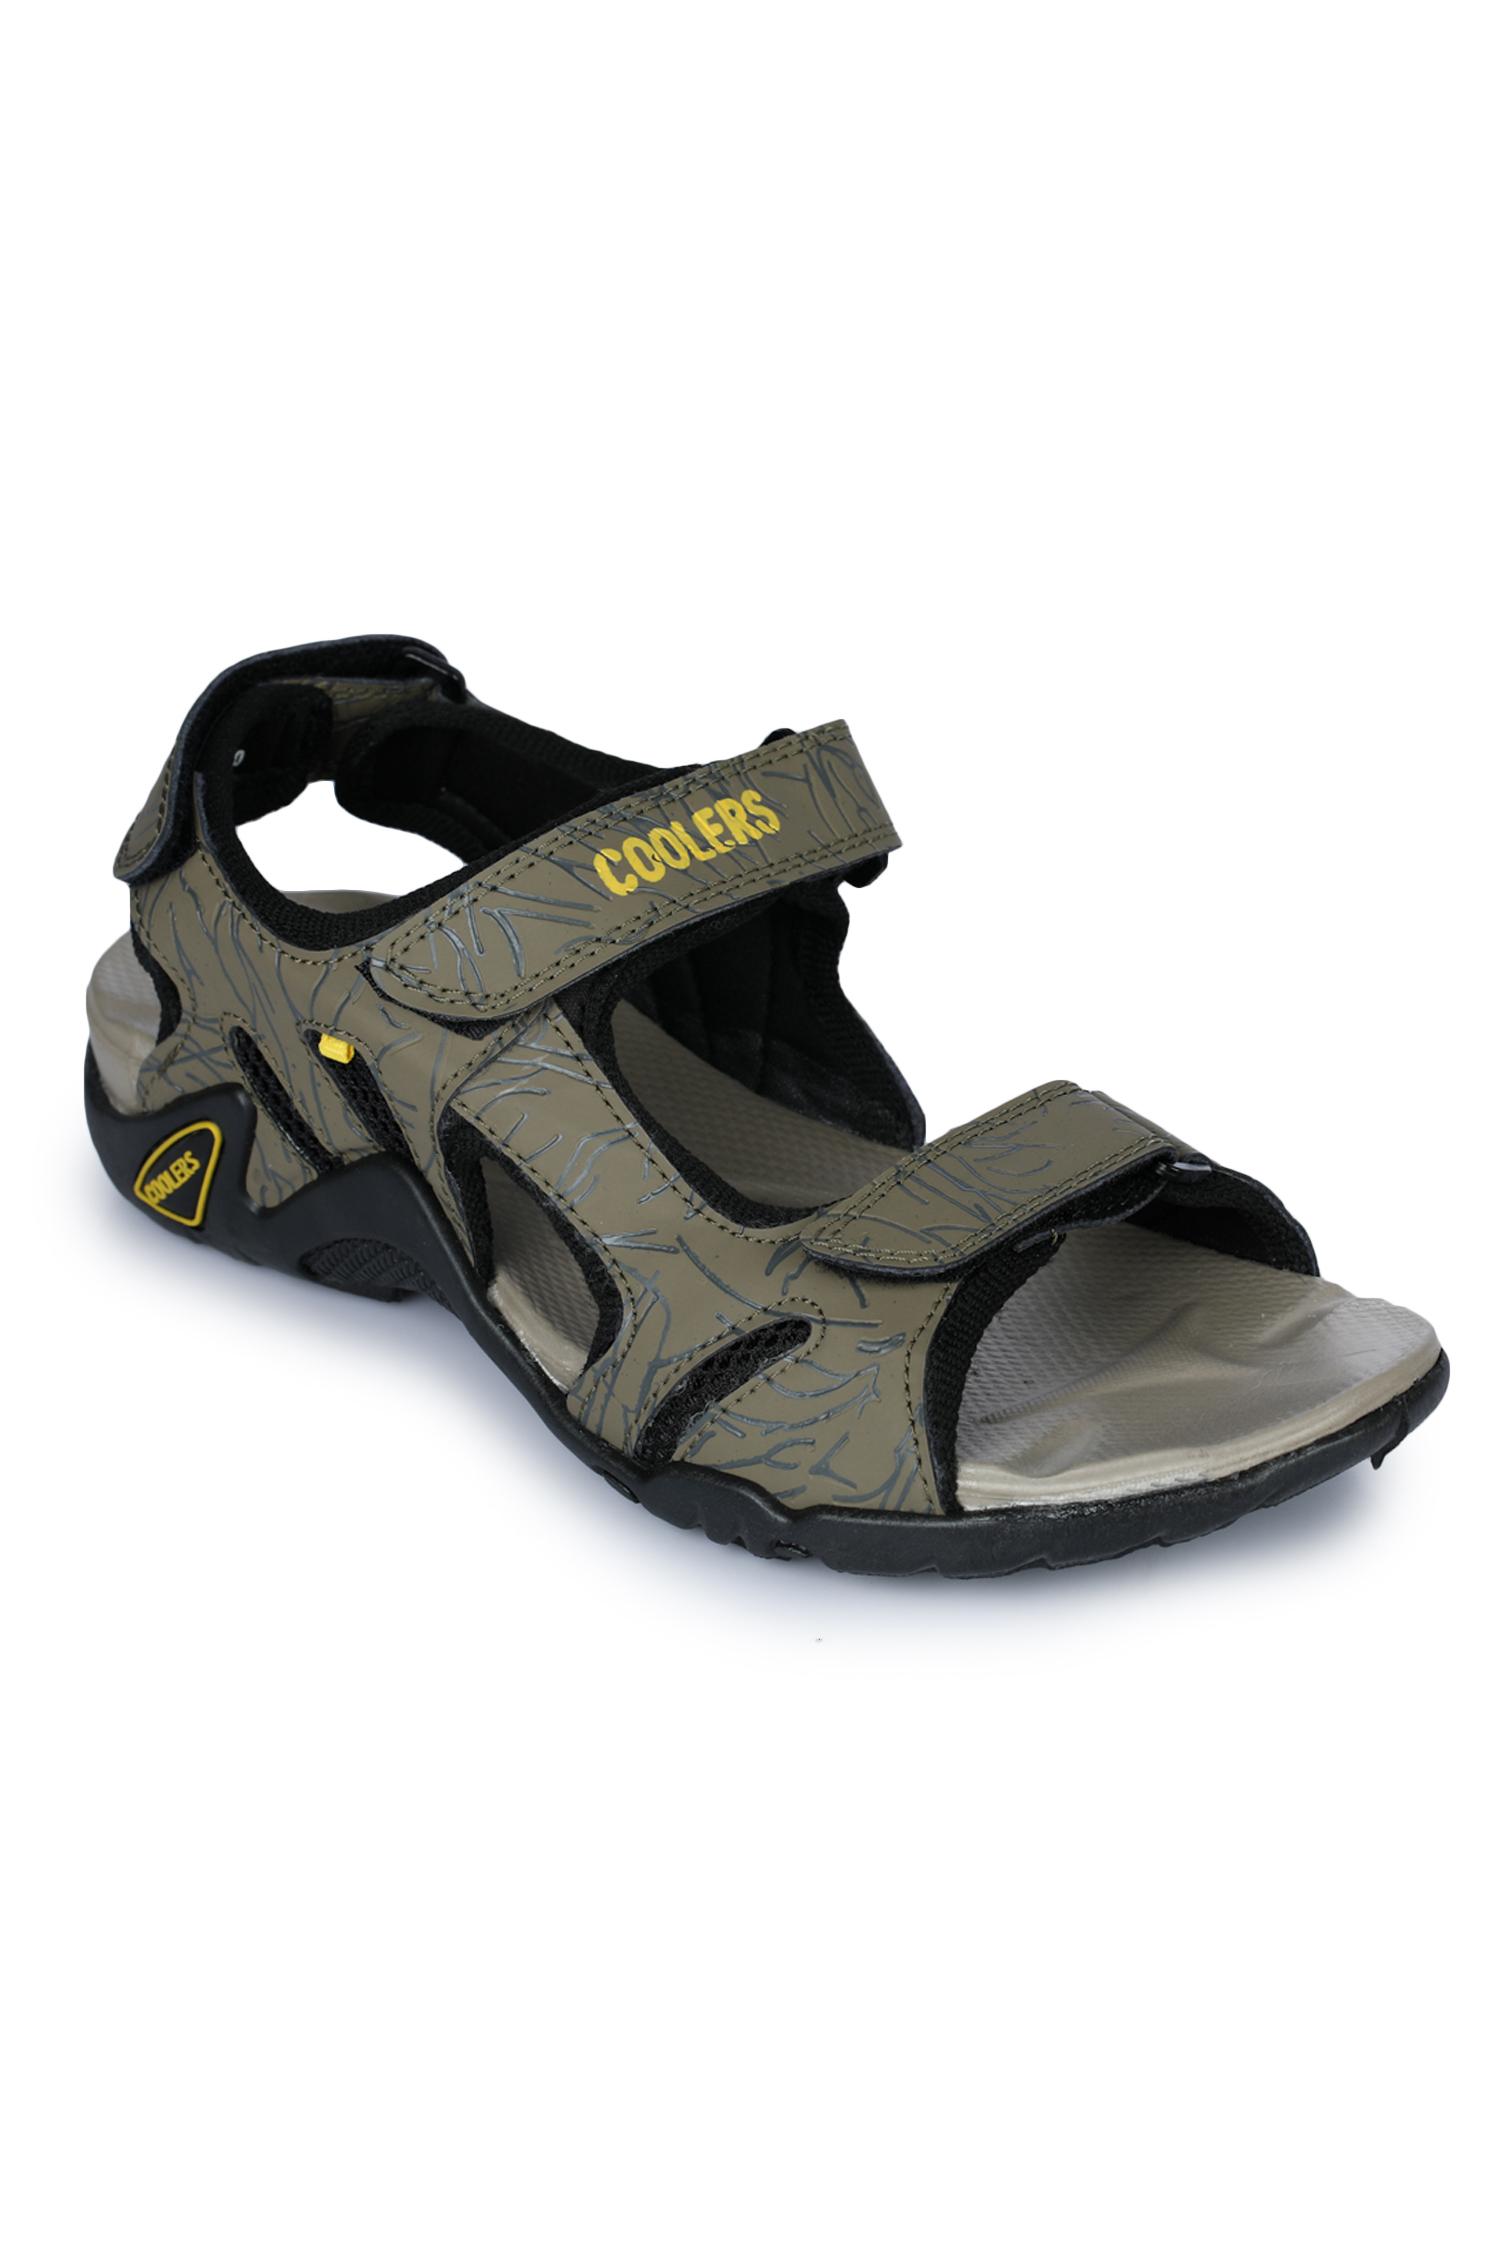 Liberty | Liberty Coolers Green Sports Sandals 8141-05_Green For - Men